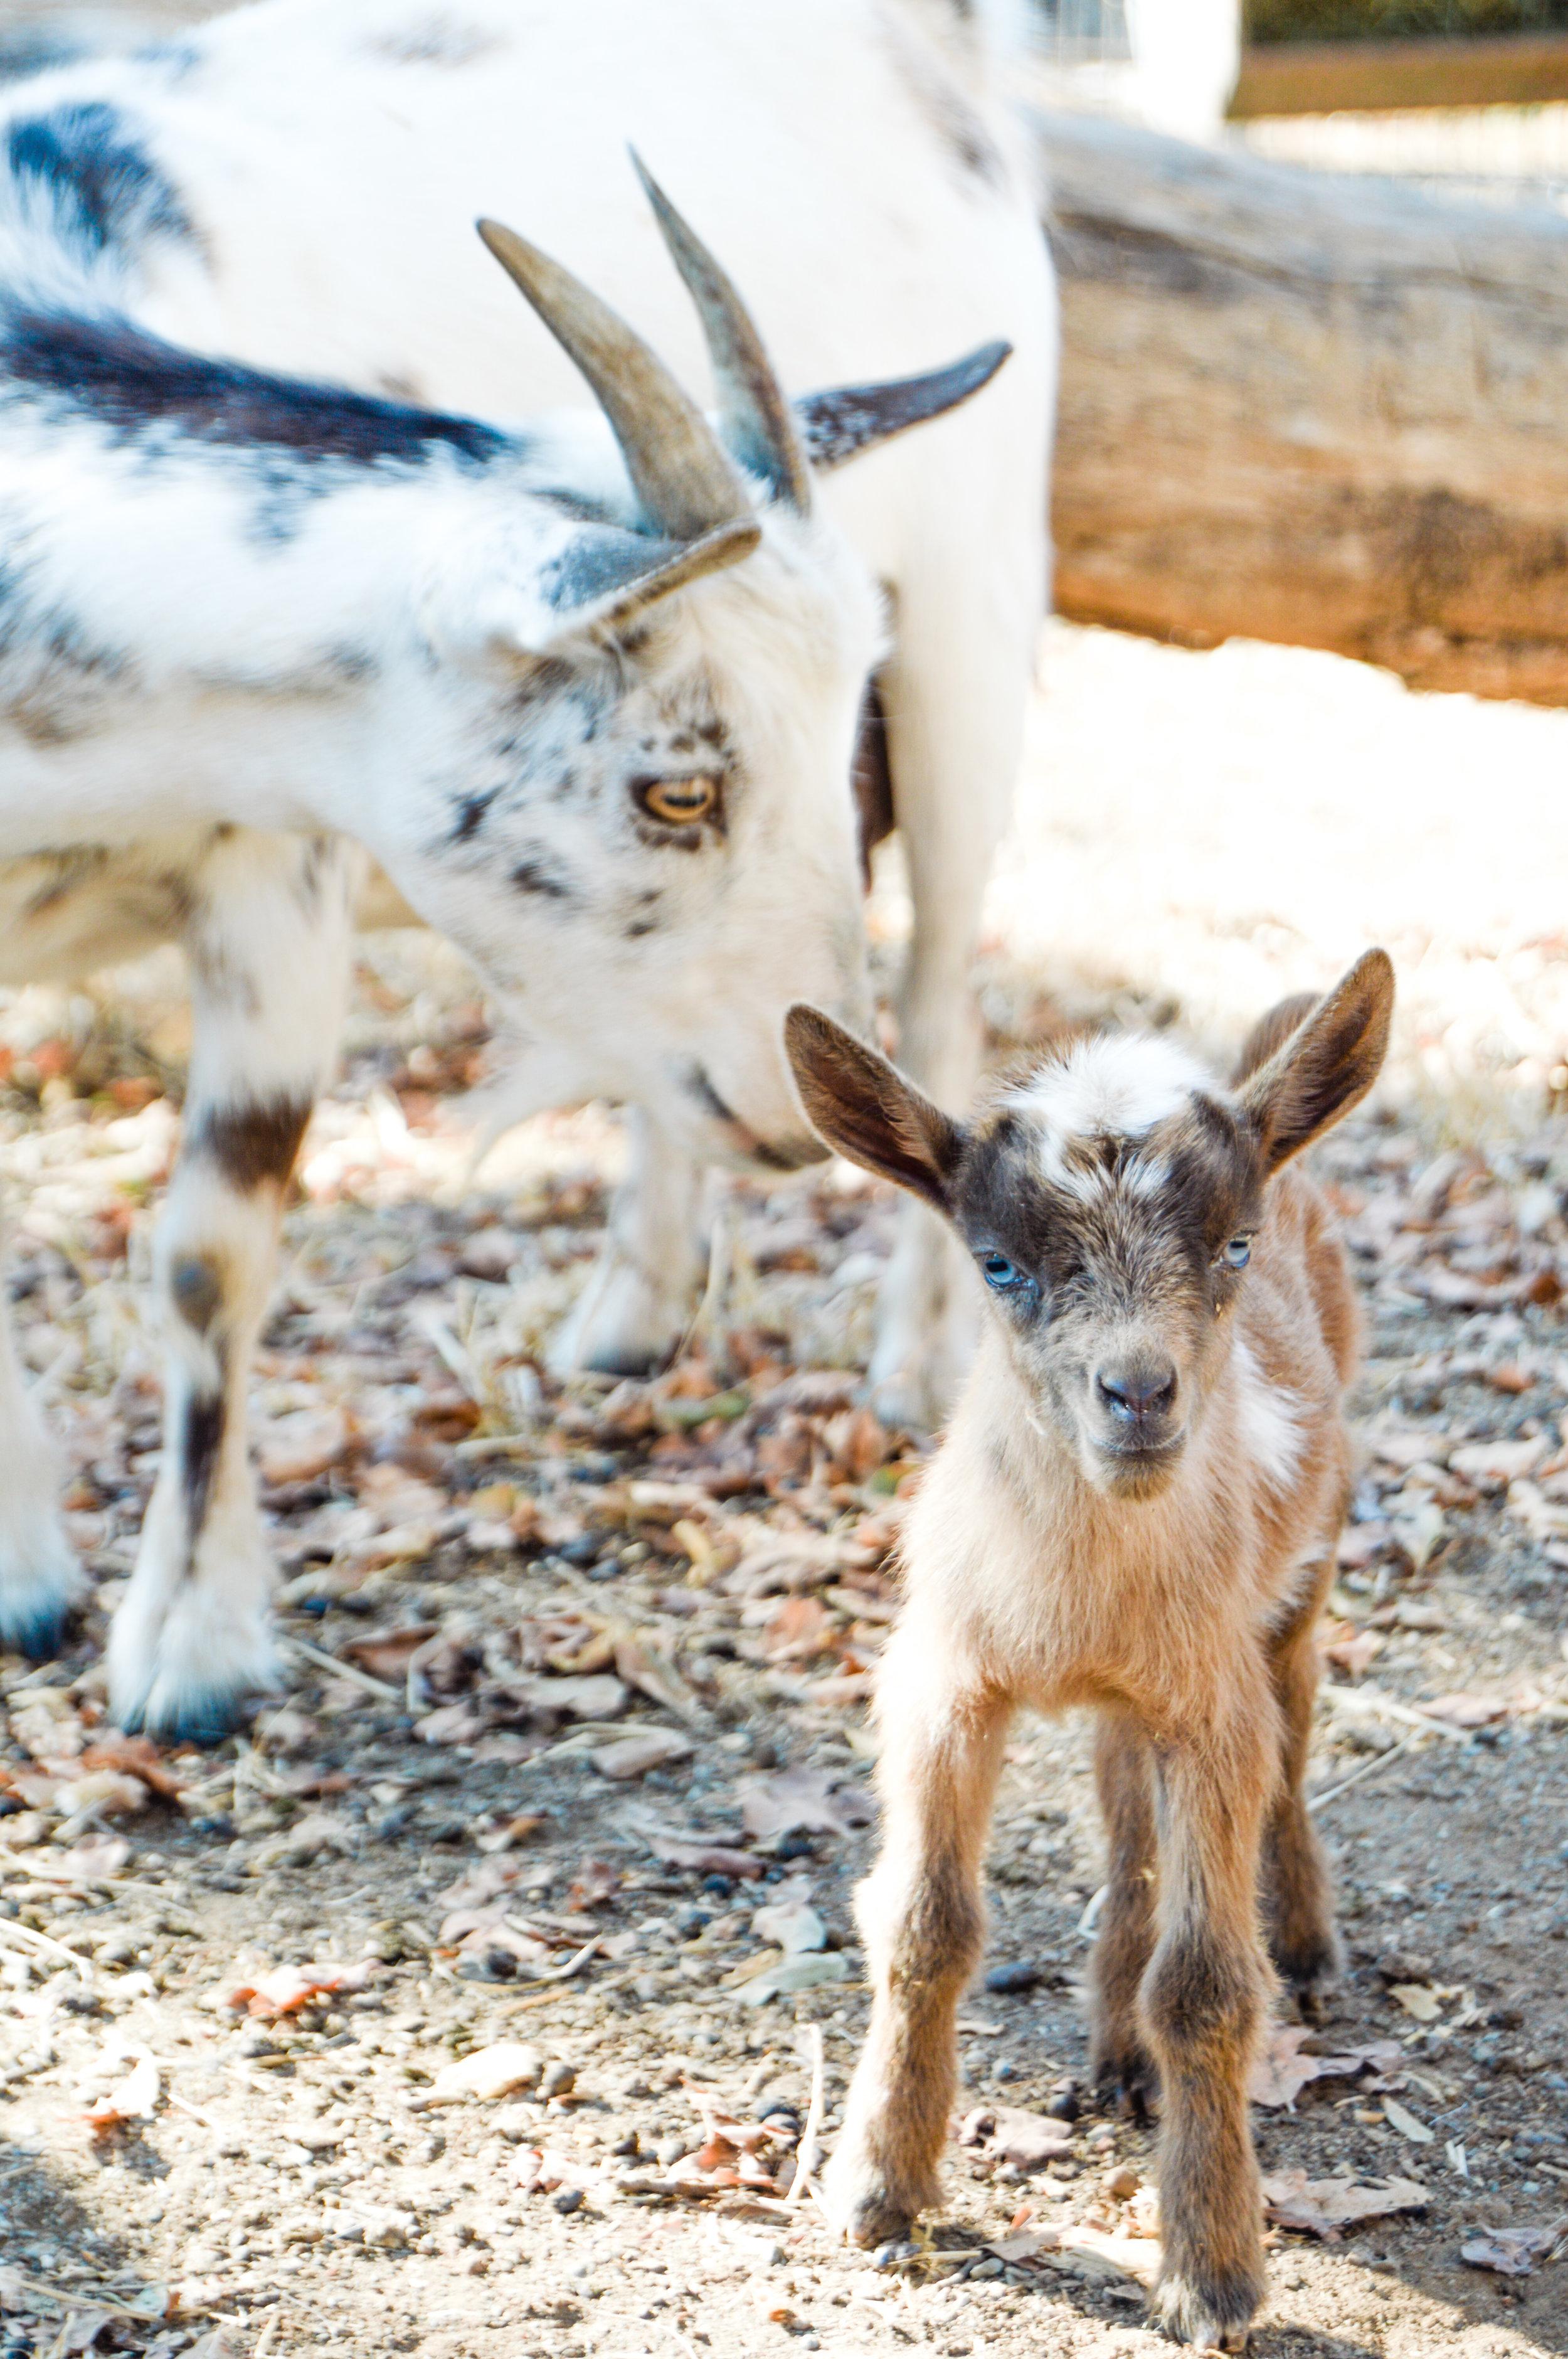 Baby goats #babygoat, #goats, #nigeriandwarfgoats , #babygoats, #goatbaby, #homesteading, #homesteadsurvival , #goatpregnancy, #farmlife, #howtodeliver, #goatlabor, #goatlabor, #kidding, #kids, #homesteadinglife